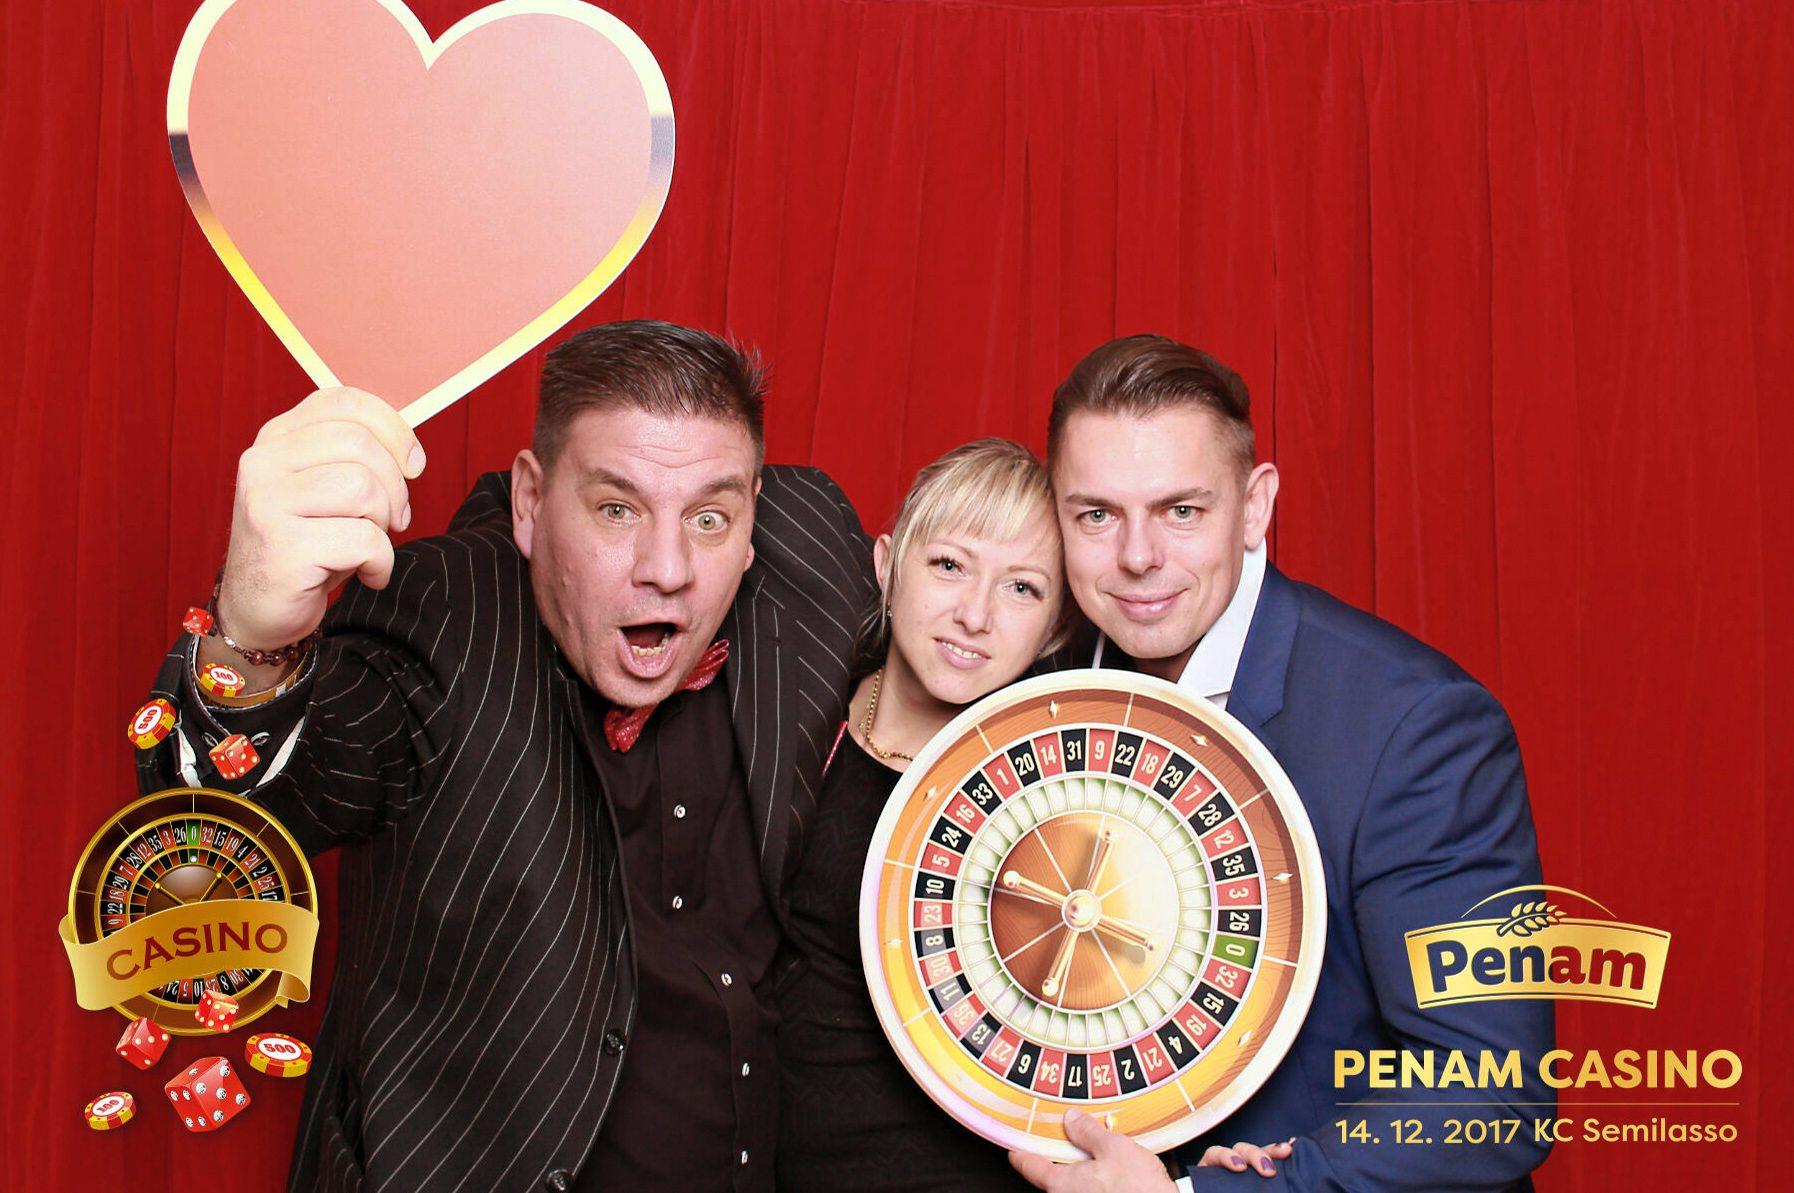 fotokoutek-penam-casino-14-12-2017-364571